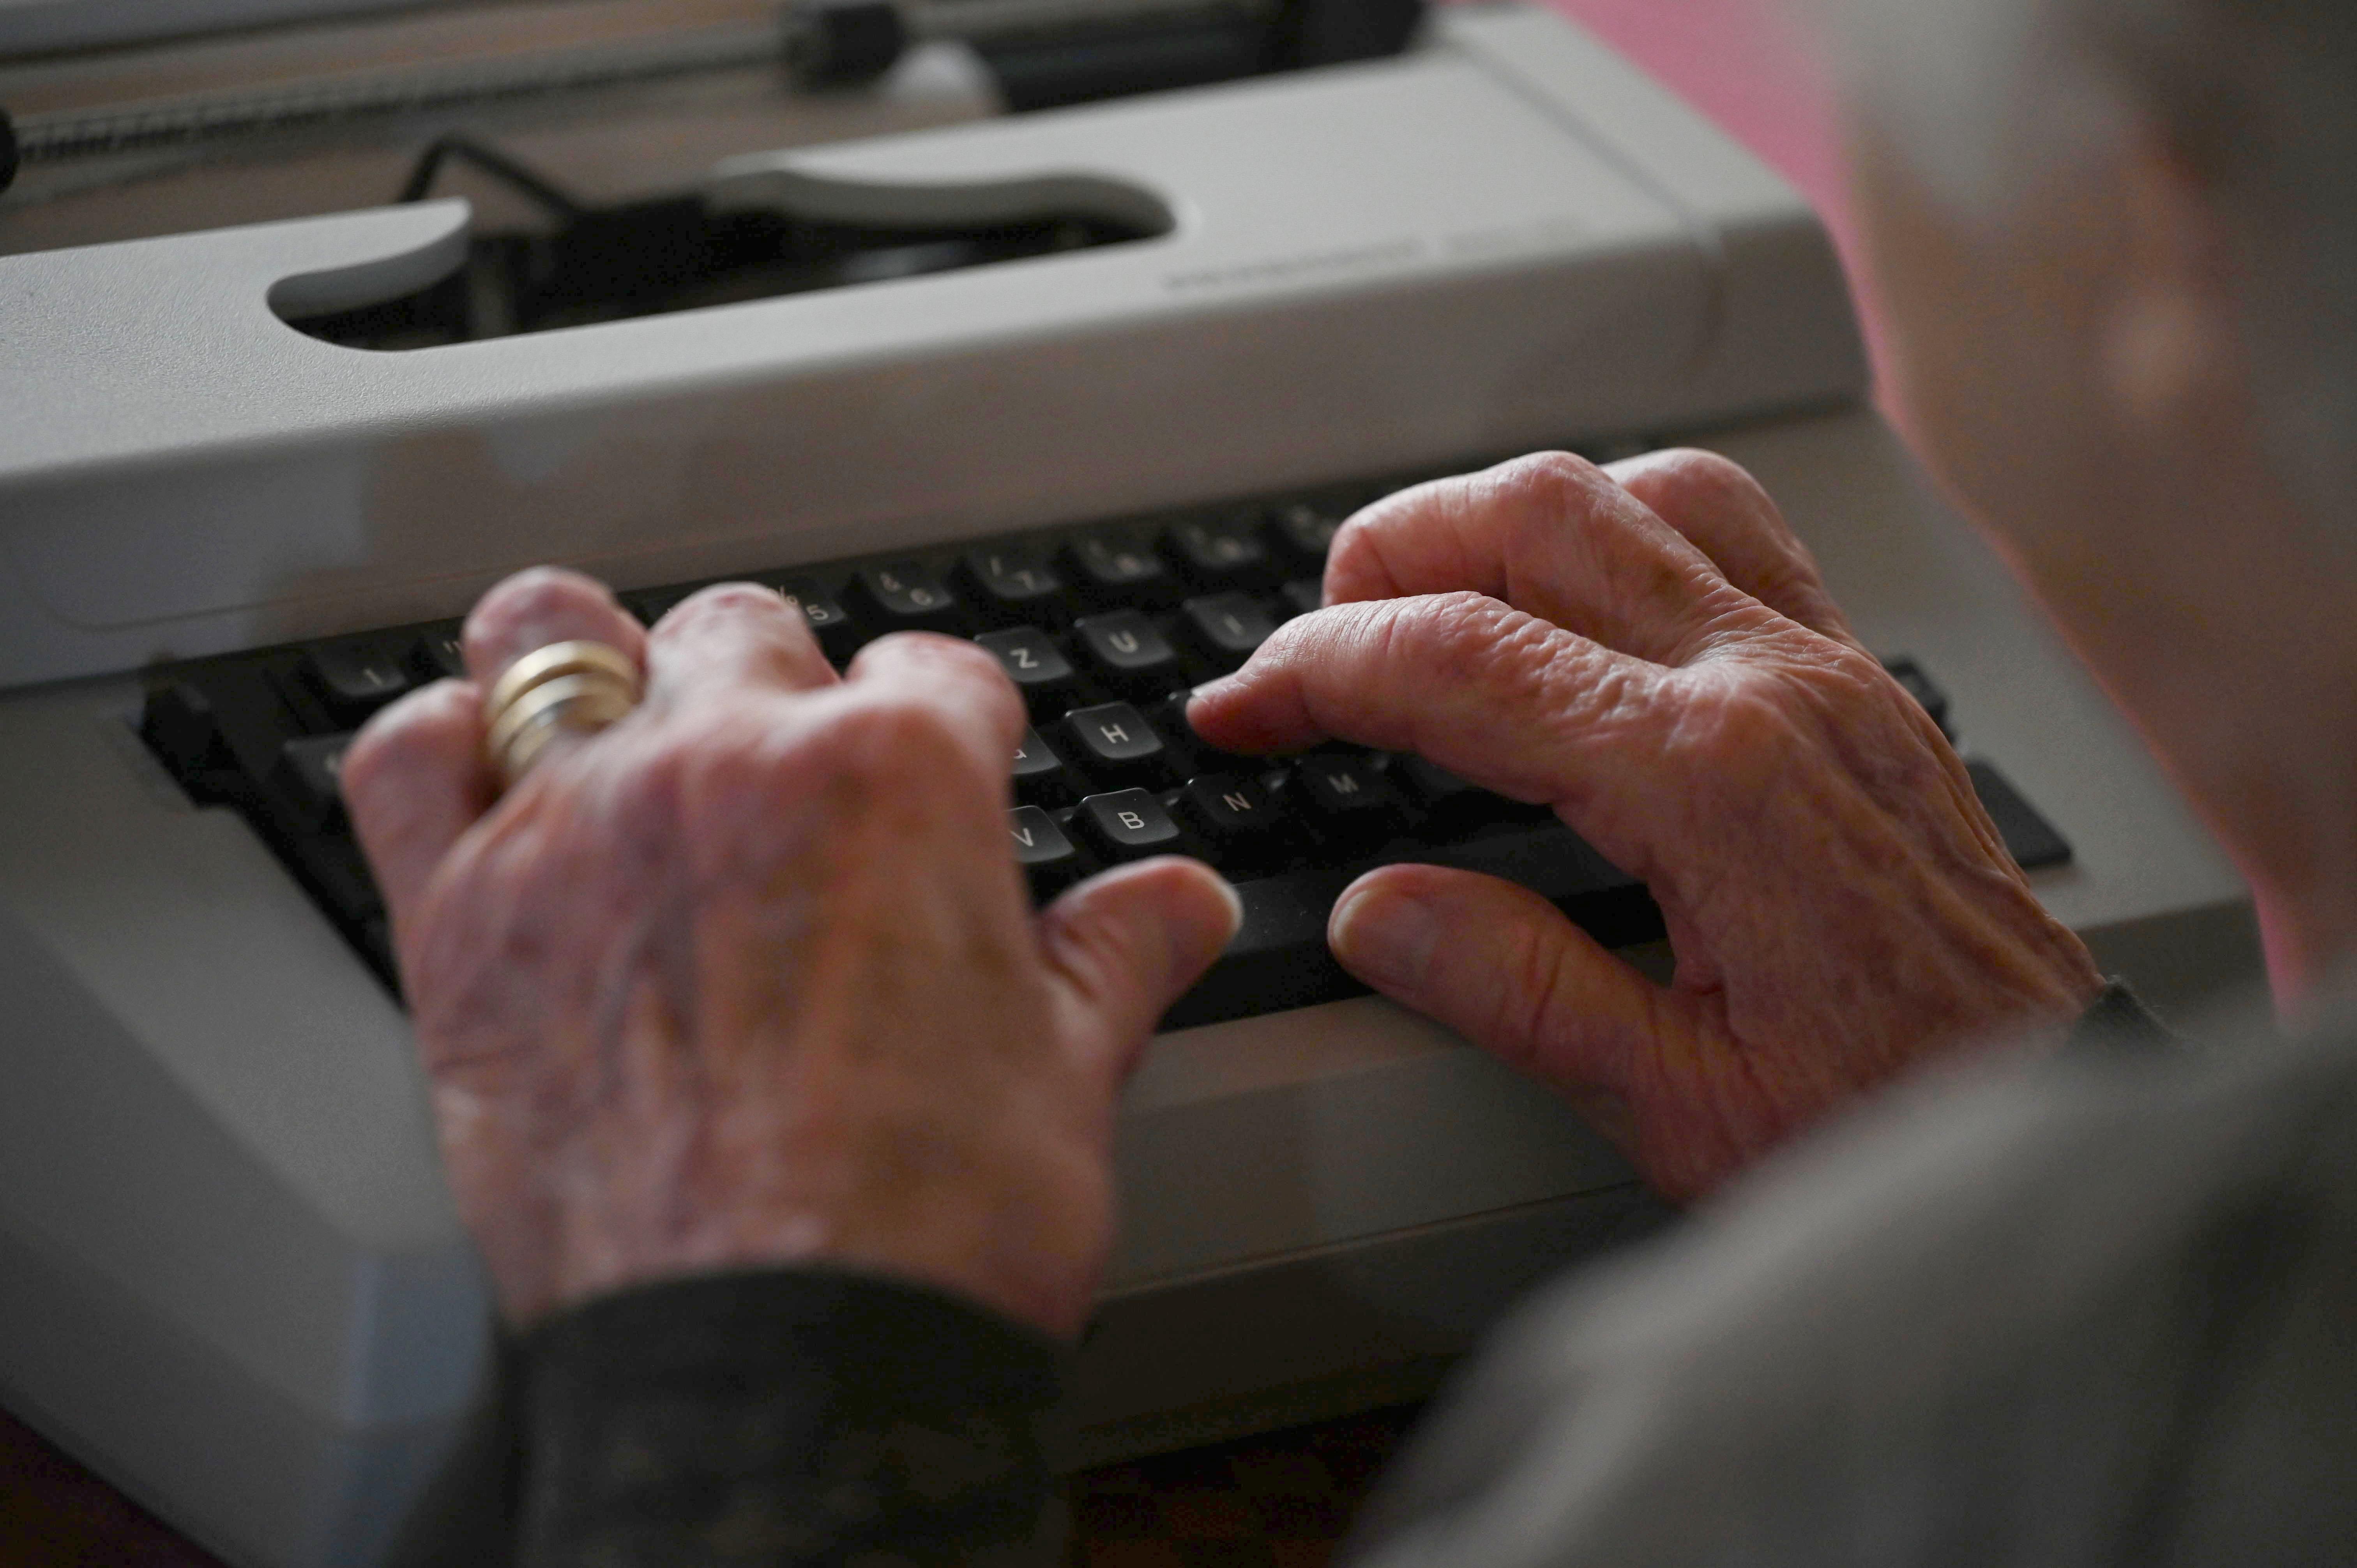 Lore Alt - former world champion with the typewriter